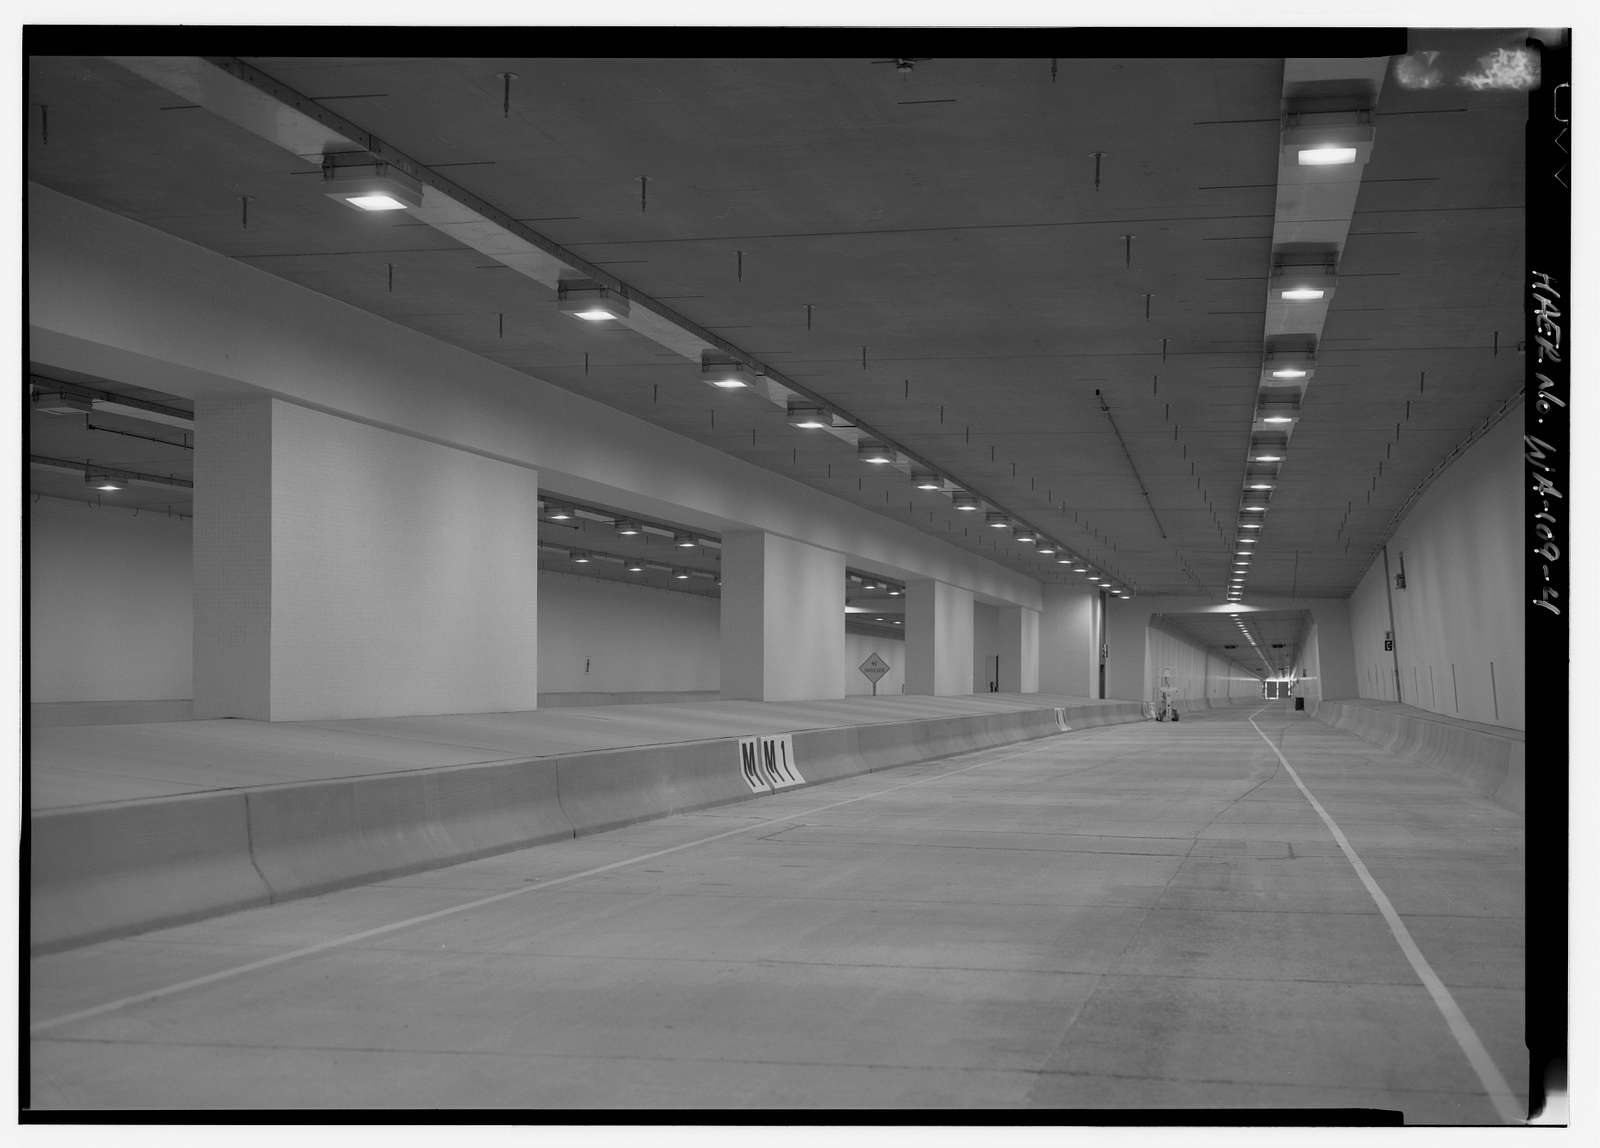 Mount Baker Ridge Tunnel, Interstate 90, passing under Mount Baker Ridge, Seattle, King County, WA